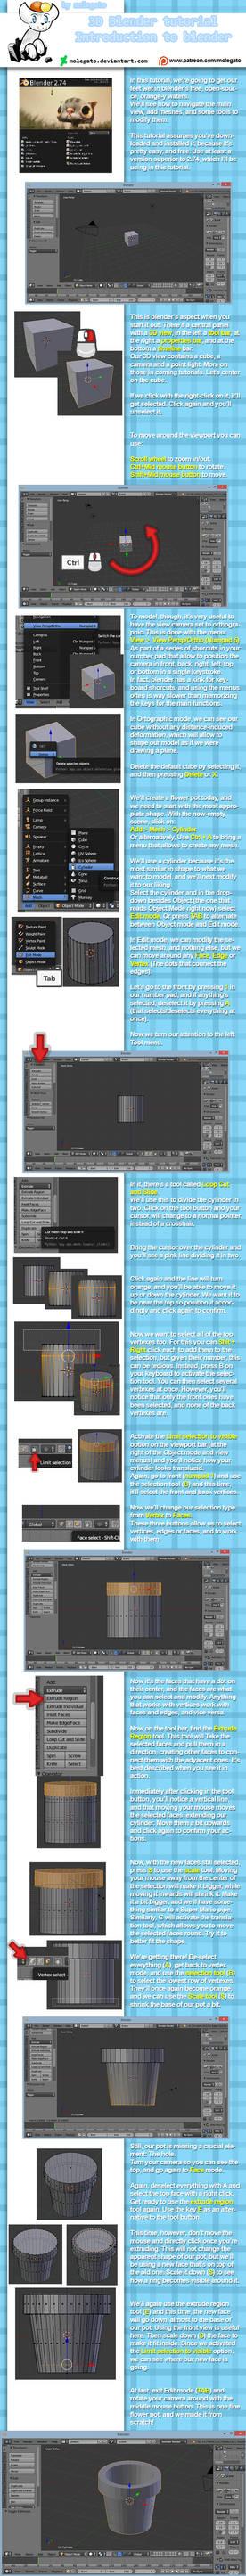 Blender tutorial 1: Introduction